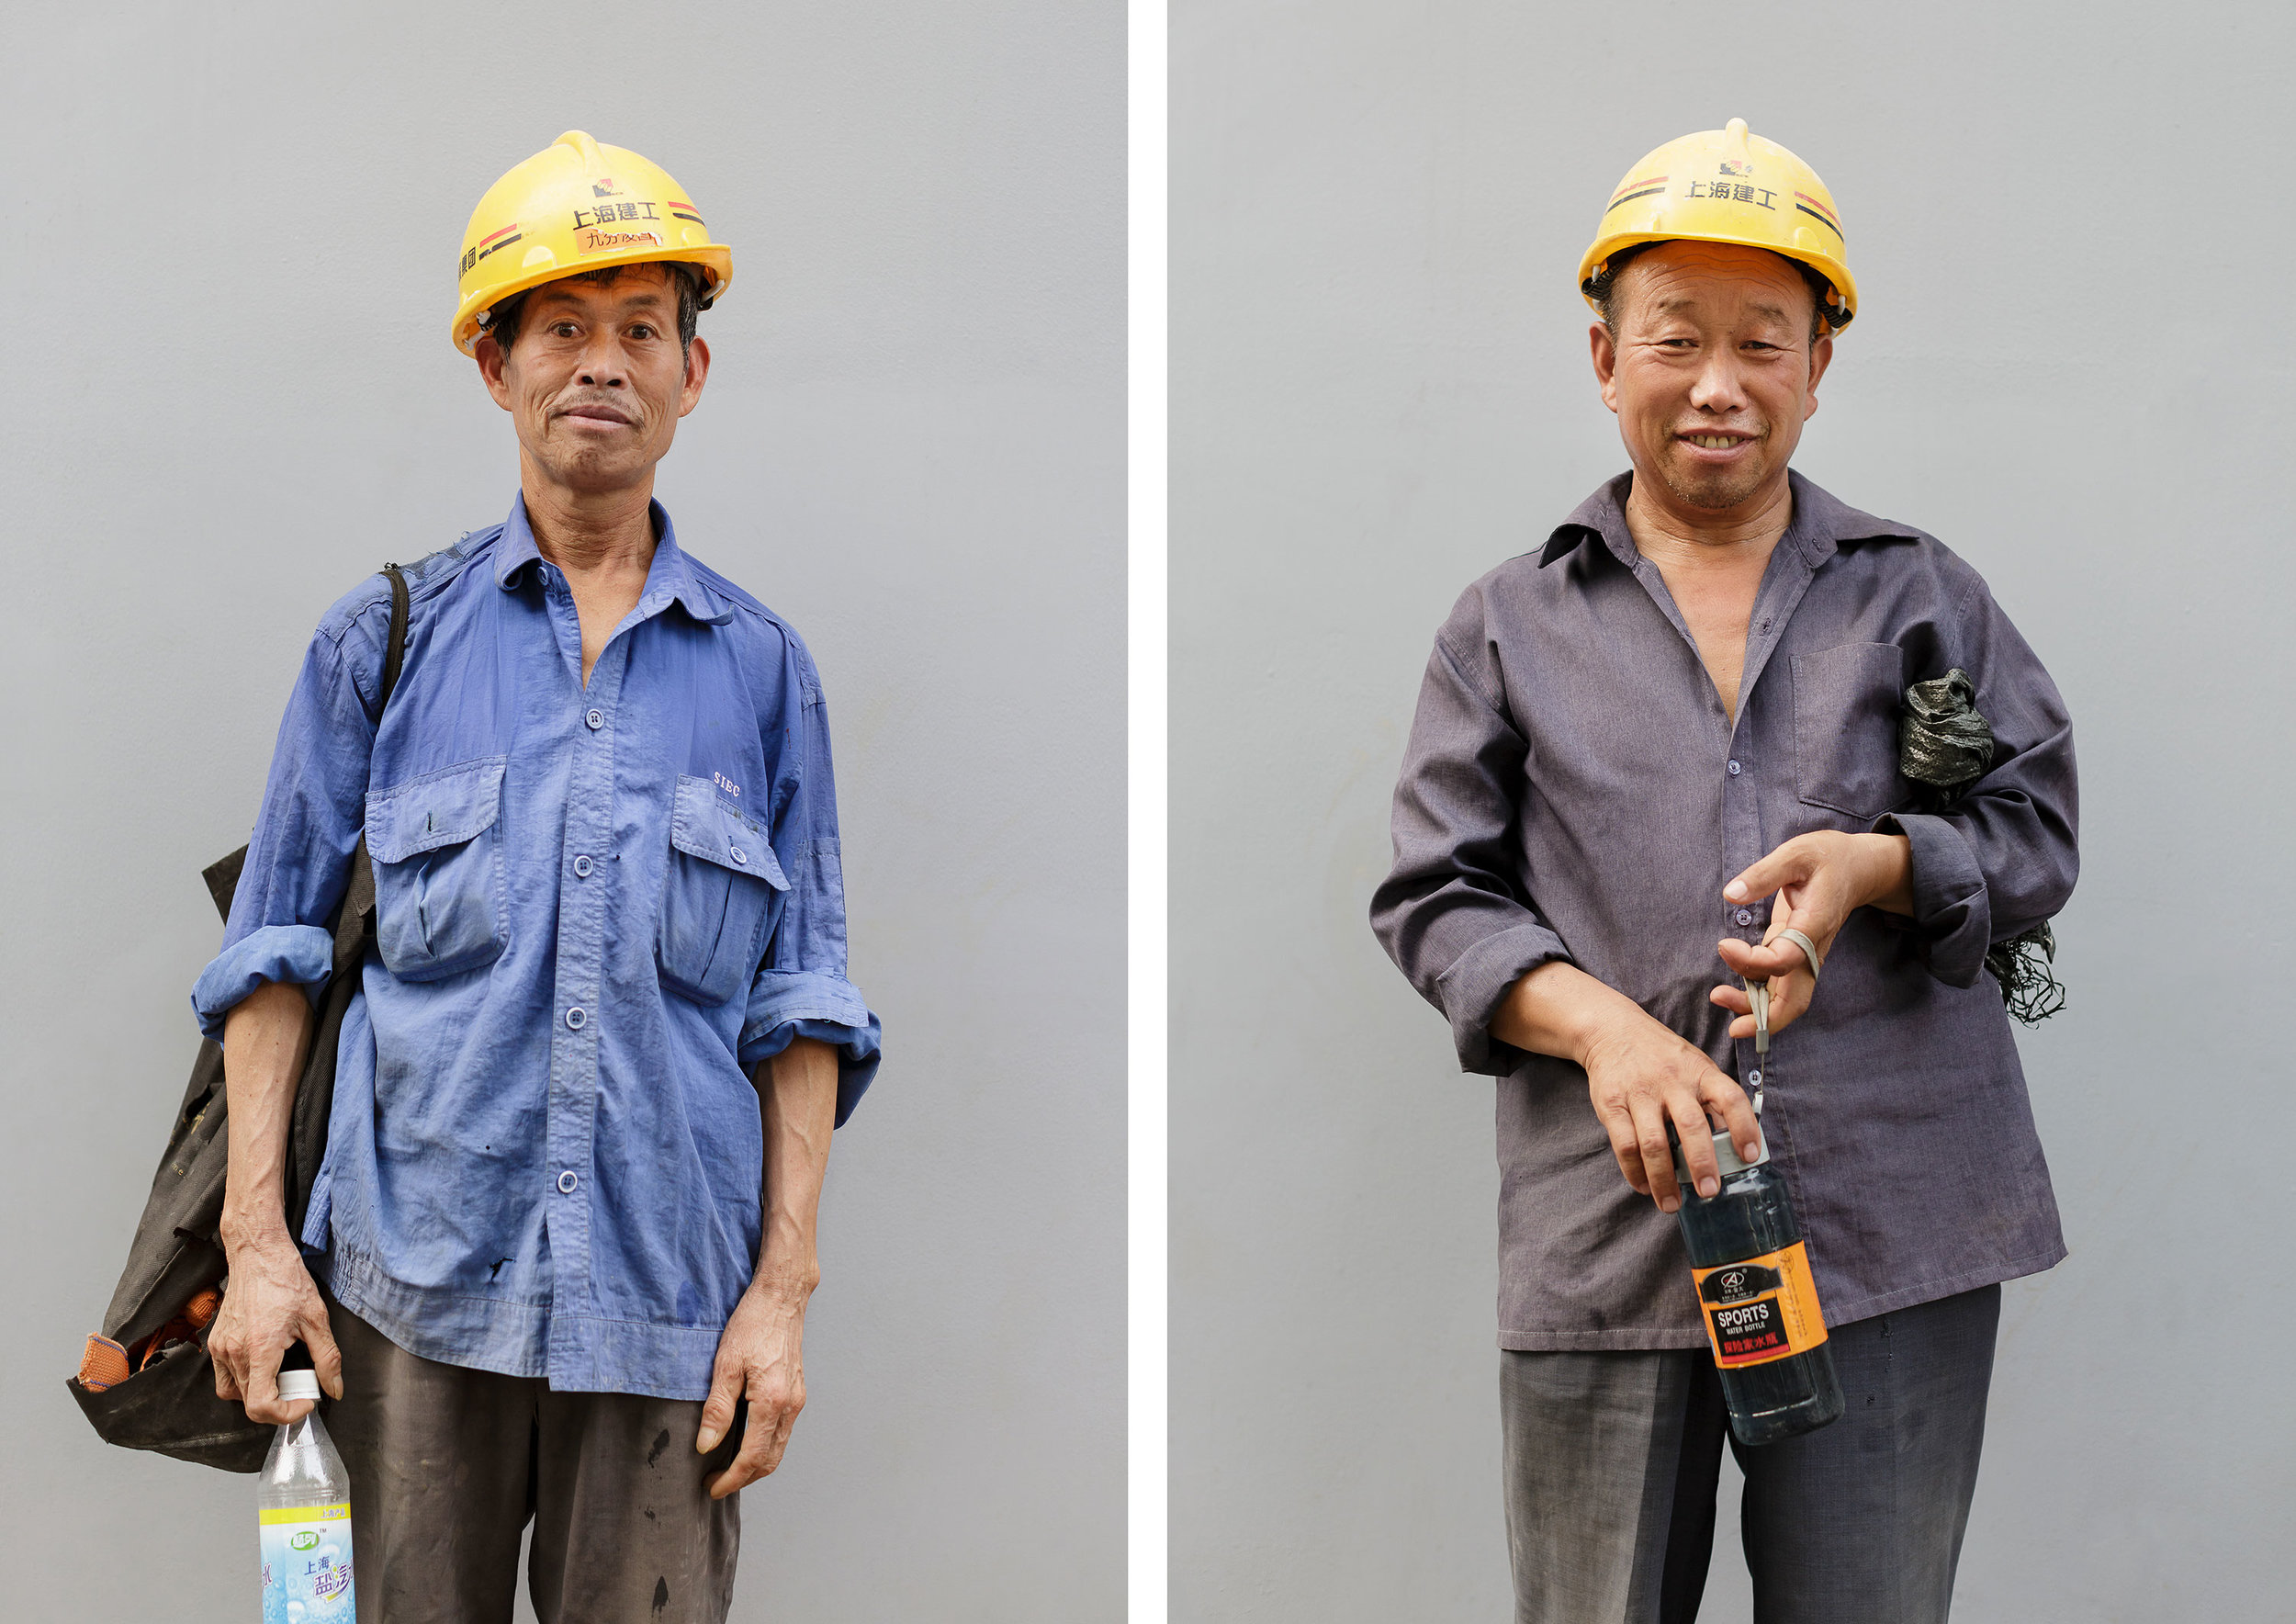 Shanghai_Tower-workers-and-building22.jpg